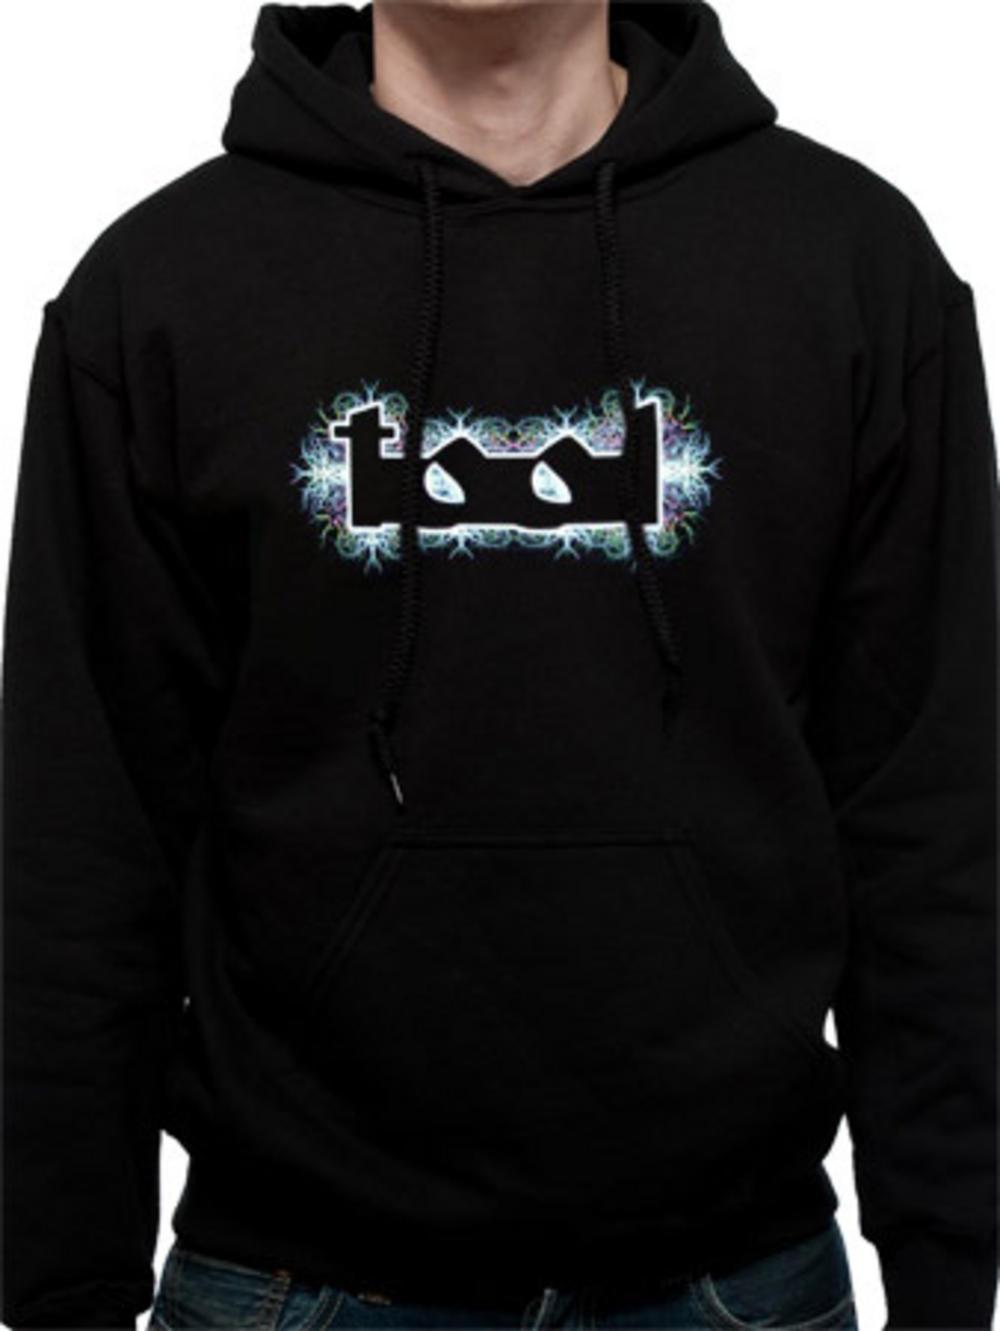 Official Tool (Nerve Endings) Hoodie. Buy Official Tool (Nerve